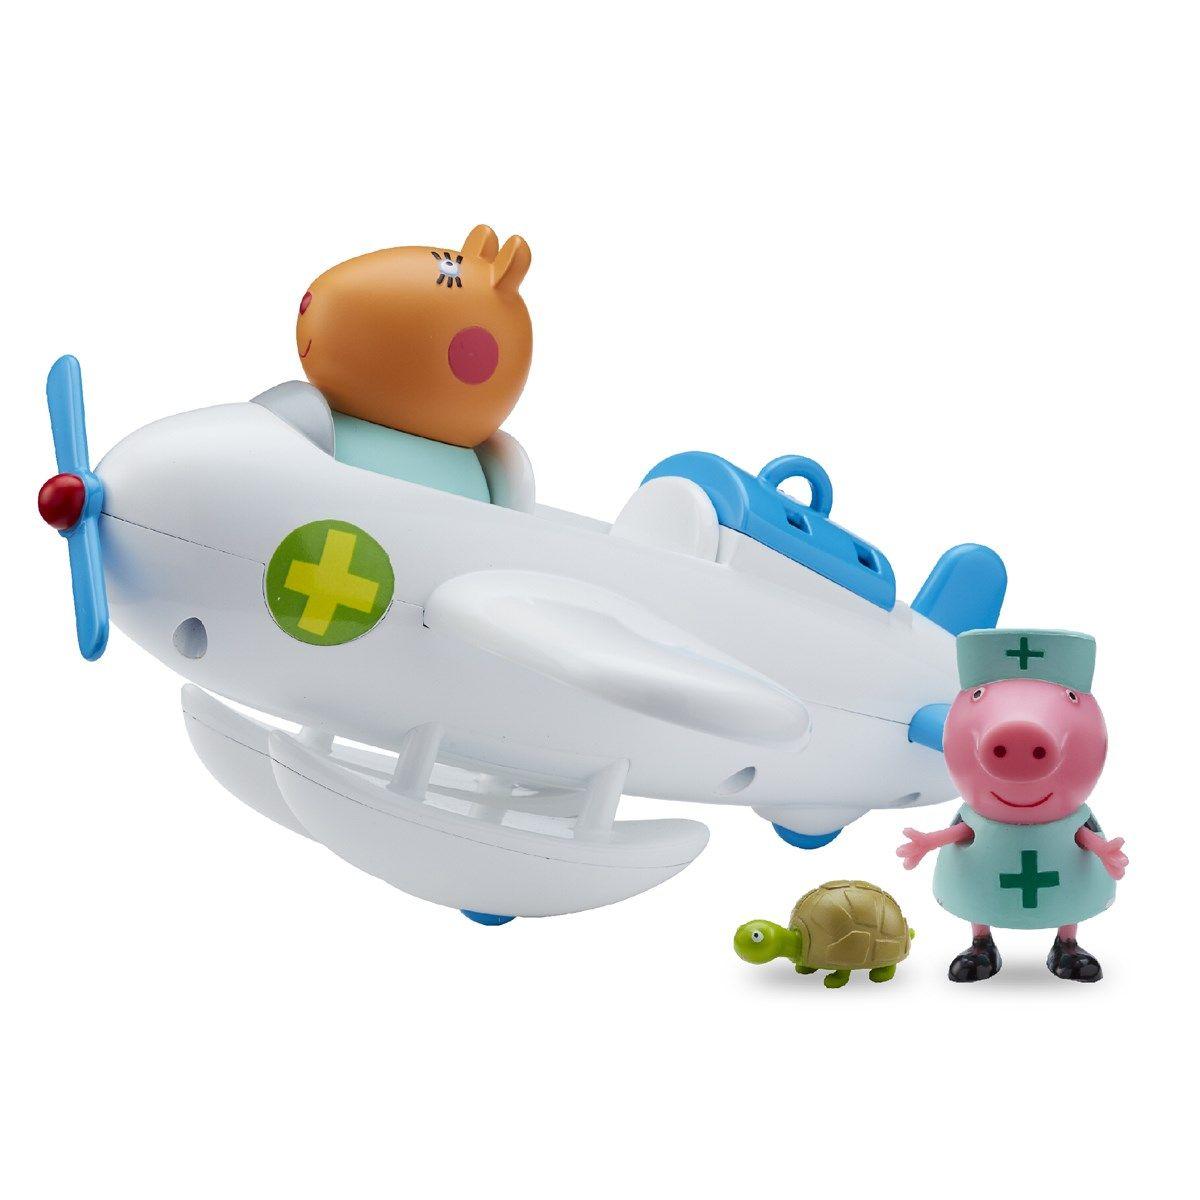 Peppa Pig - Dr. Hamster Plane (905-07349)